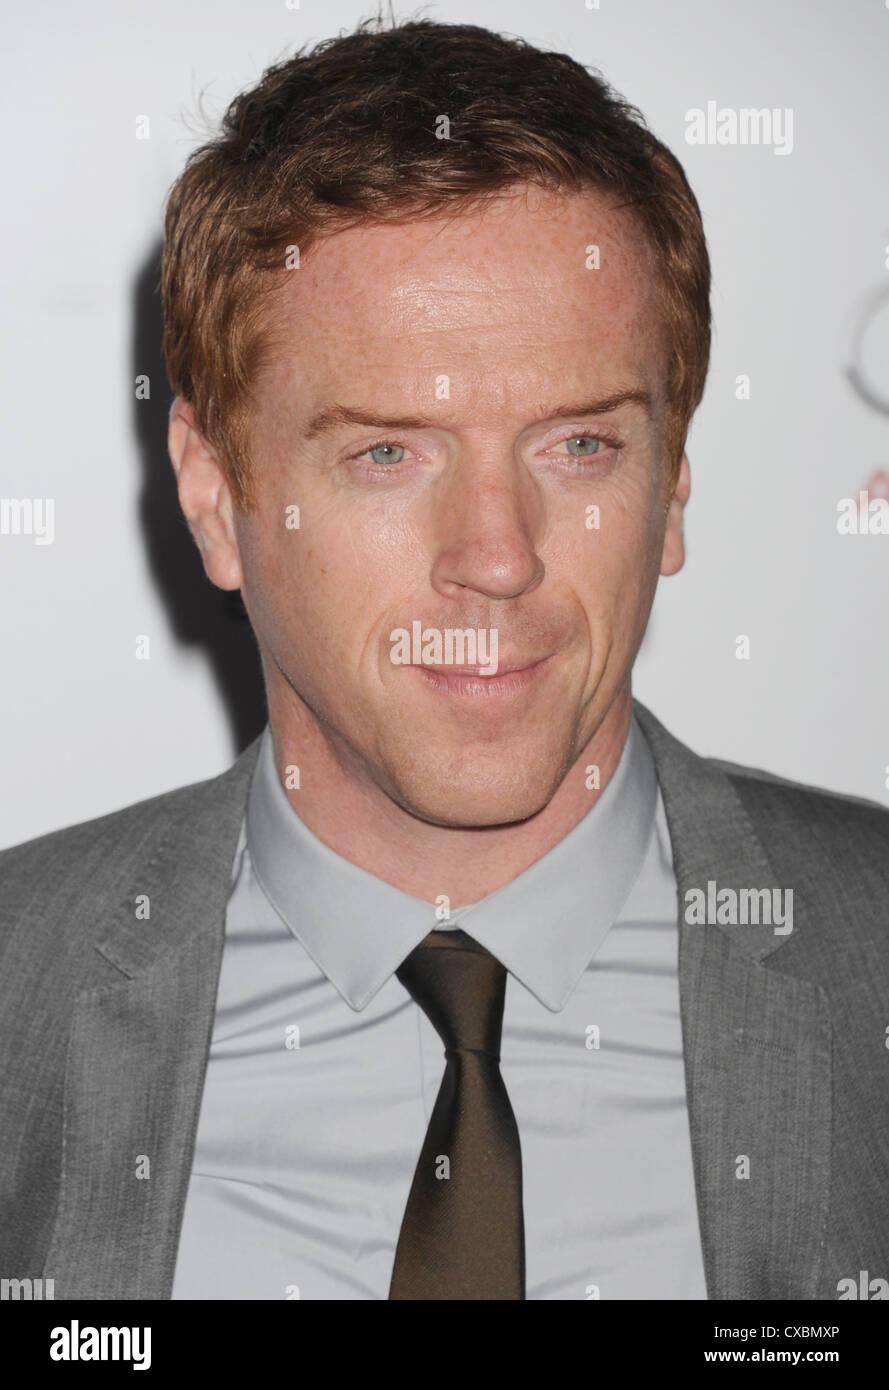 DAMIAN LEWIS  UK actor in September 2012. Photo Jeffrey Mayer - Stock Image